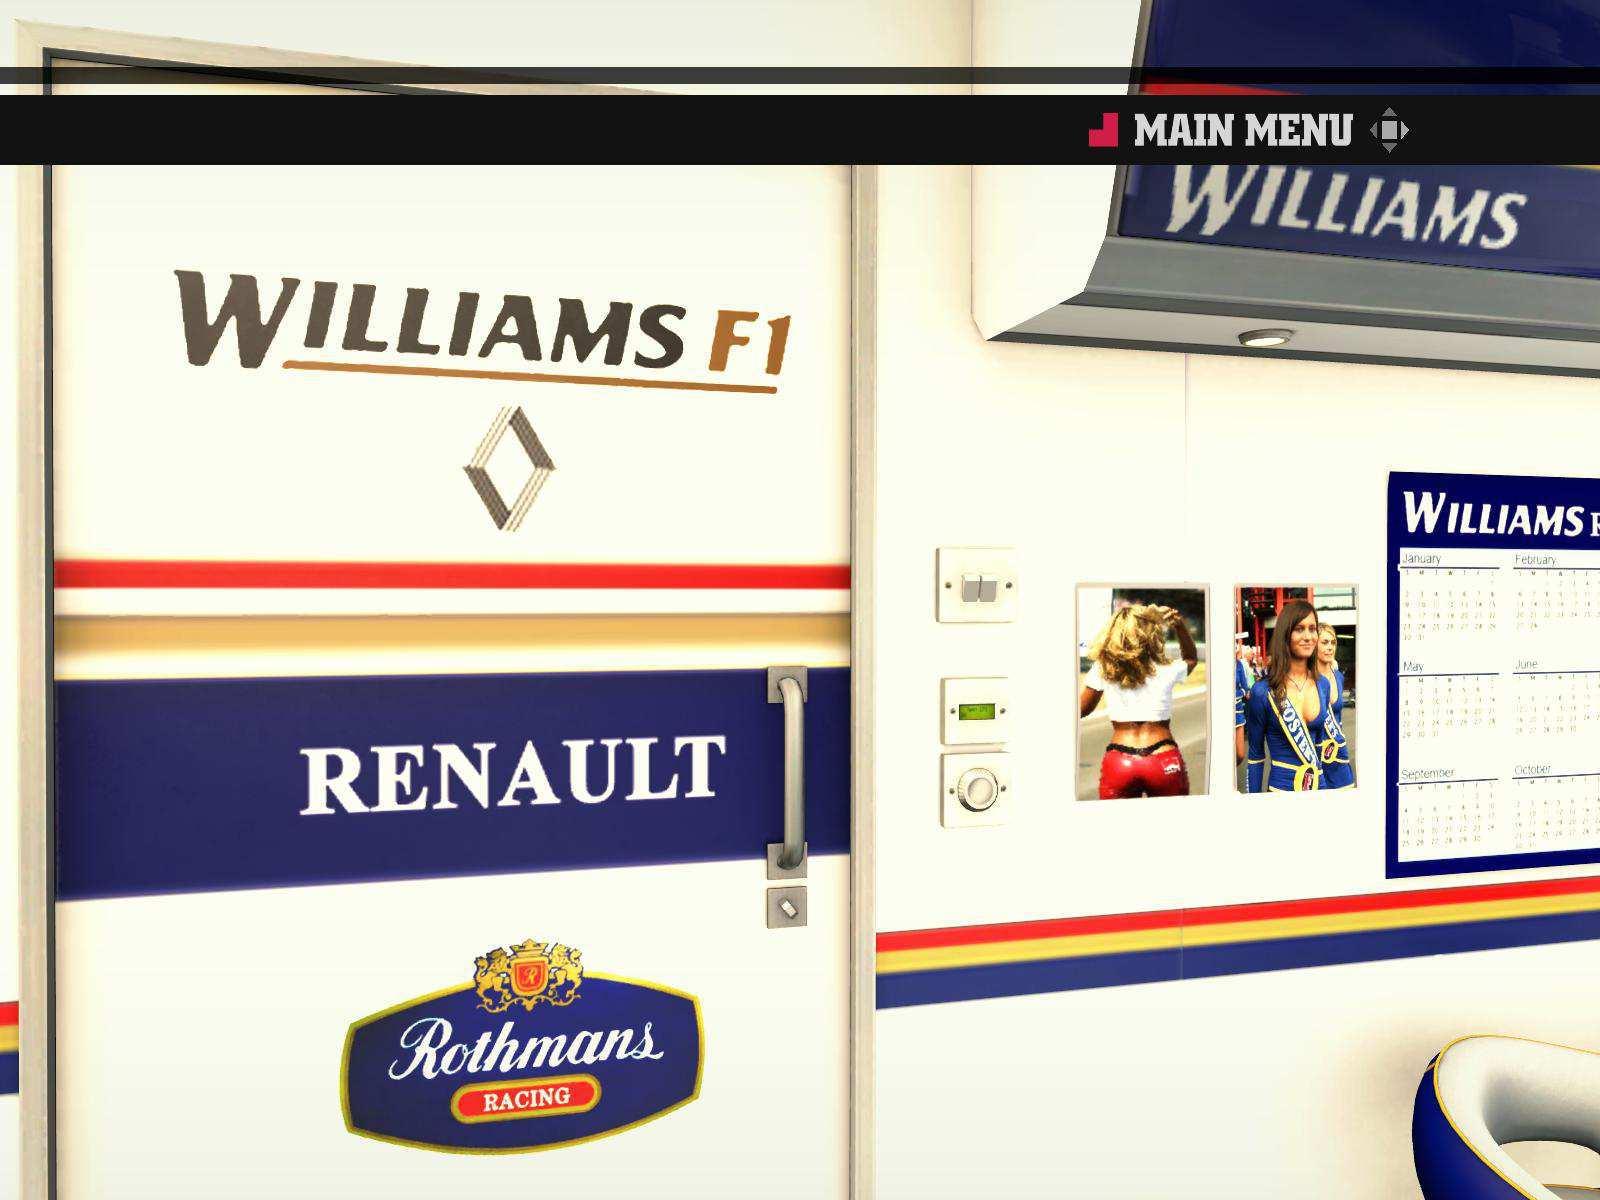 1994 Williams_5-S.jpg